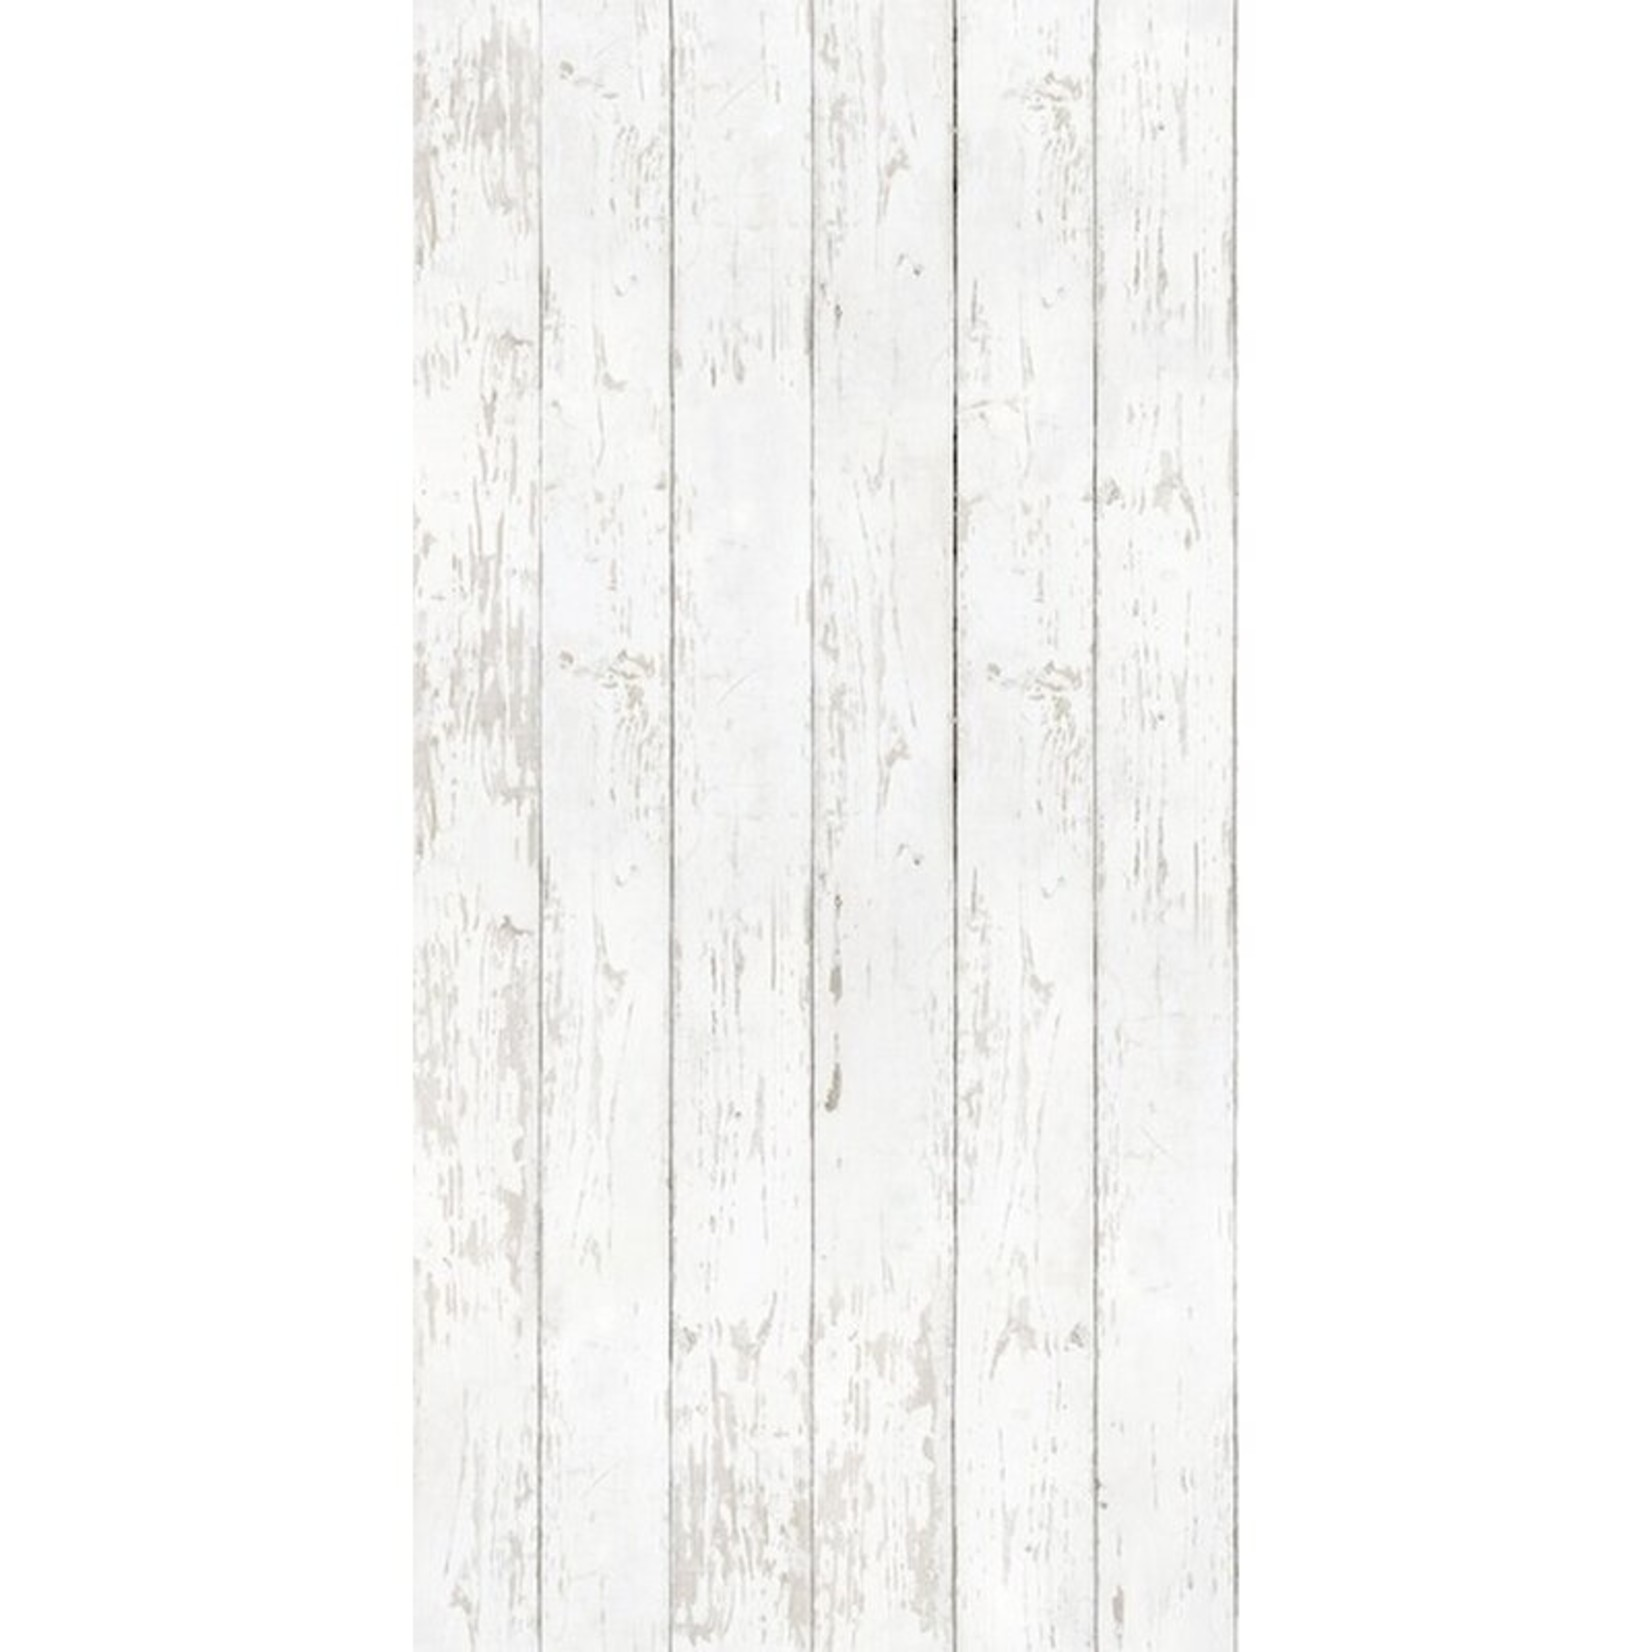 "*Hepburn Wood 48"" L x 24"" W Paintable Peel and Stick Wallpaper Panel"